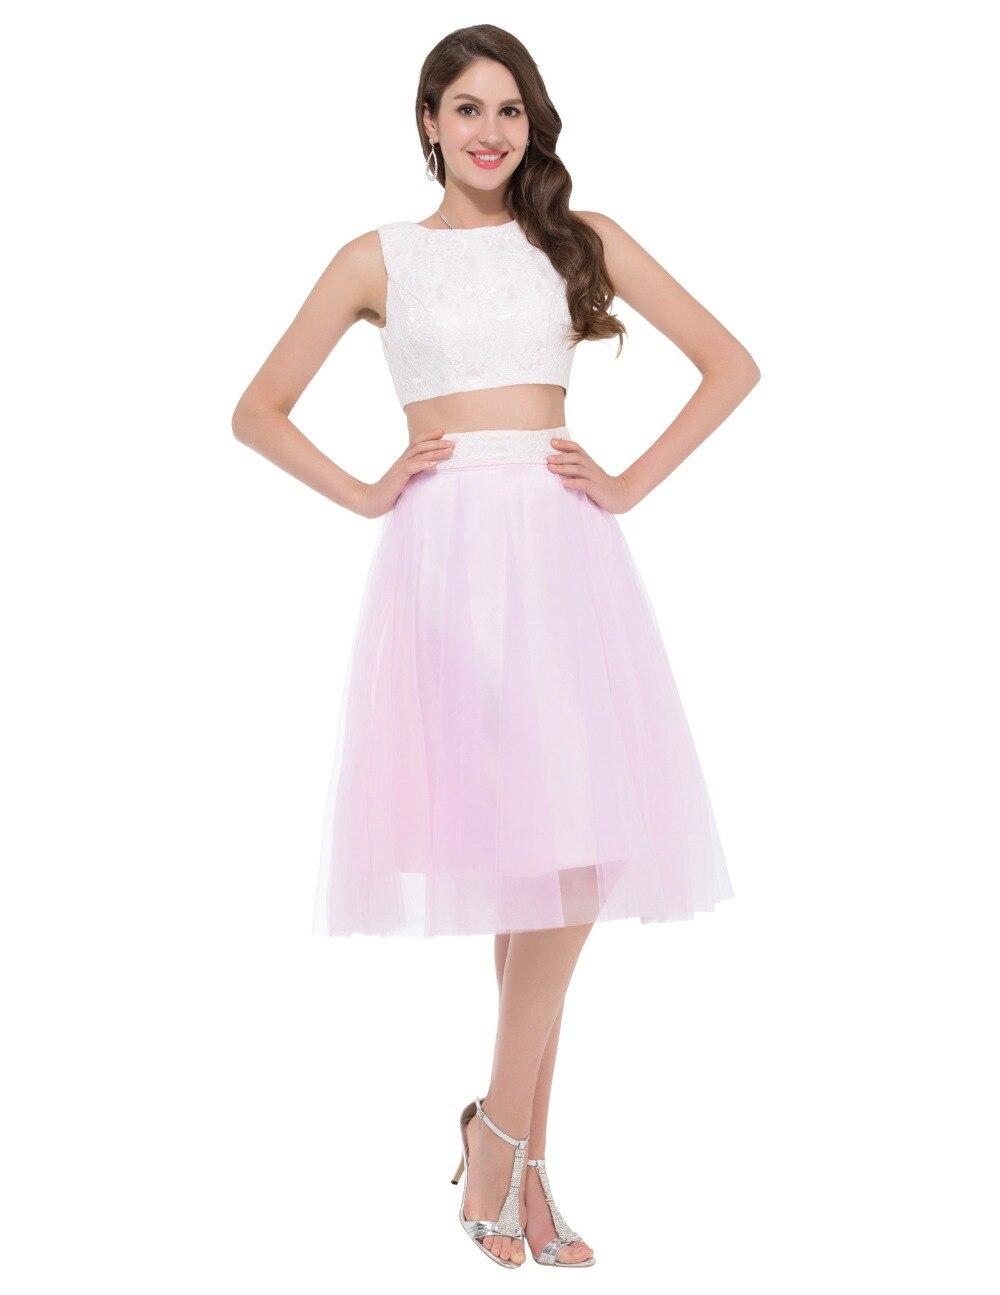 Short 2 Piece Prom Dresses 2016 Grace Karin White Pink Satin Tulle ...